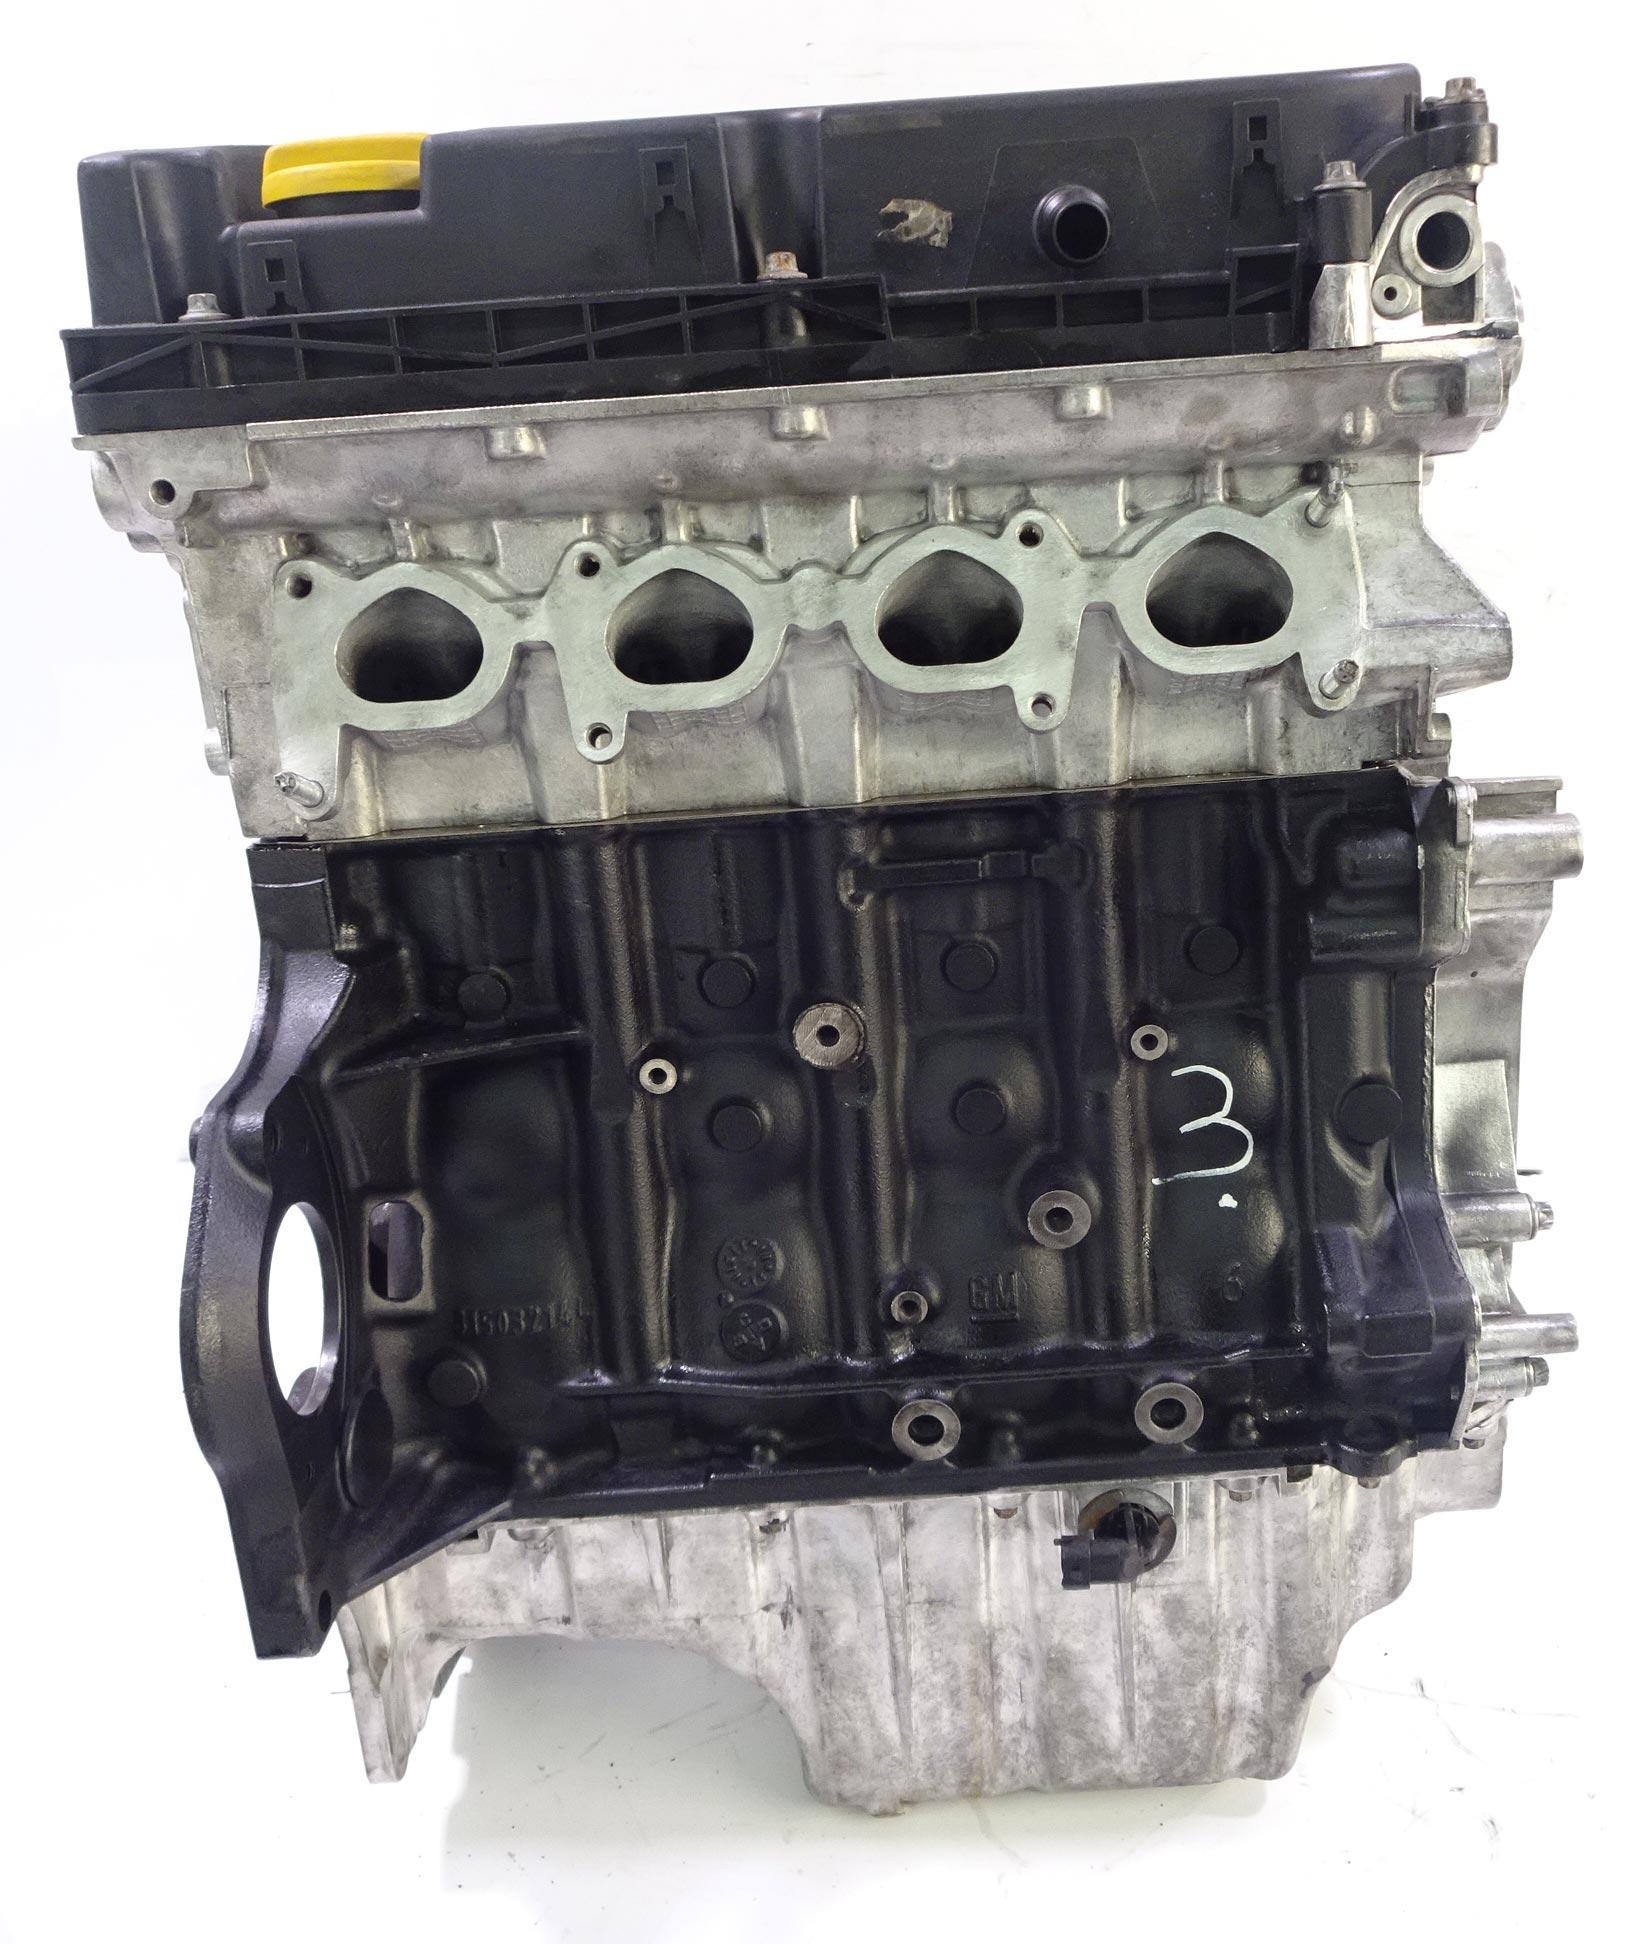 Motor 2010 Opel Corsa D 1,6 Turbo Benzin Z16LER Z16 192 PS